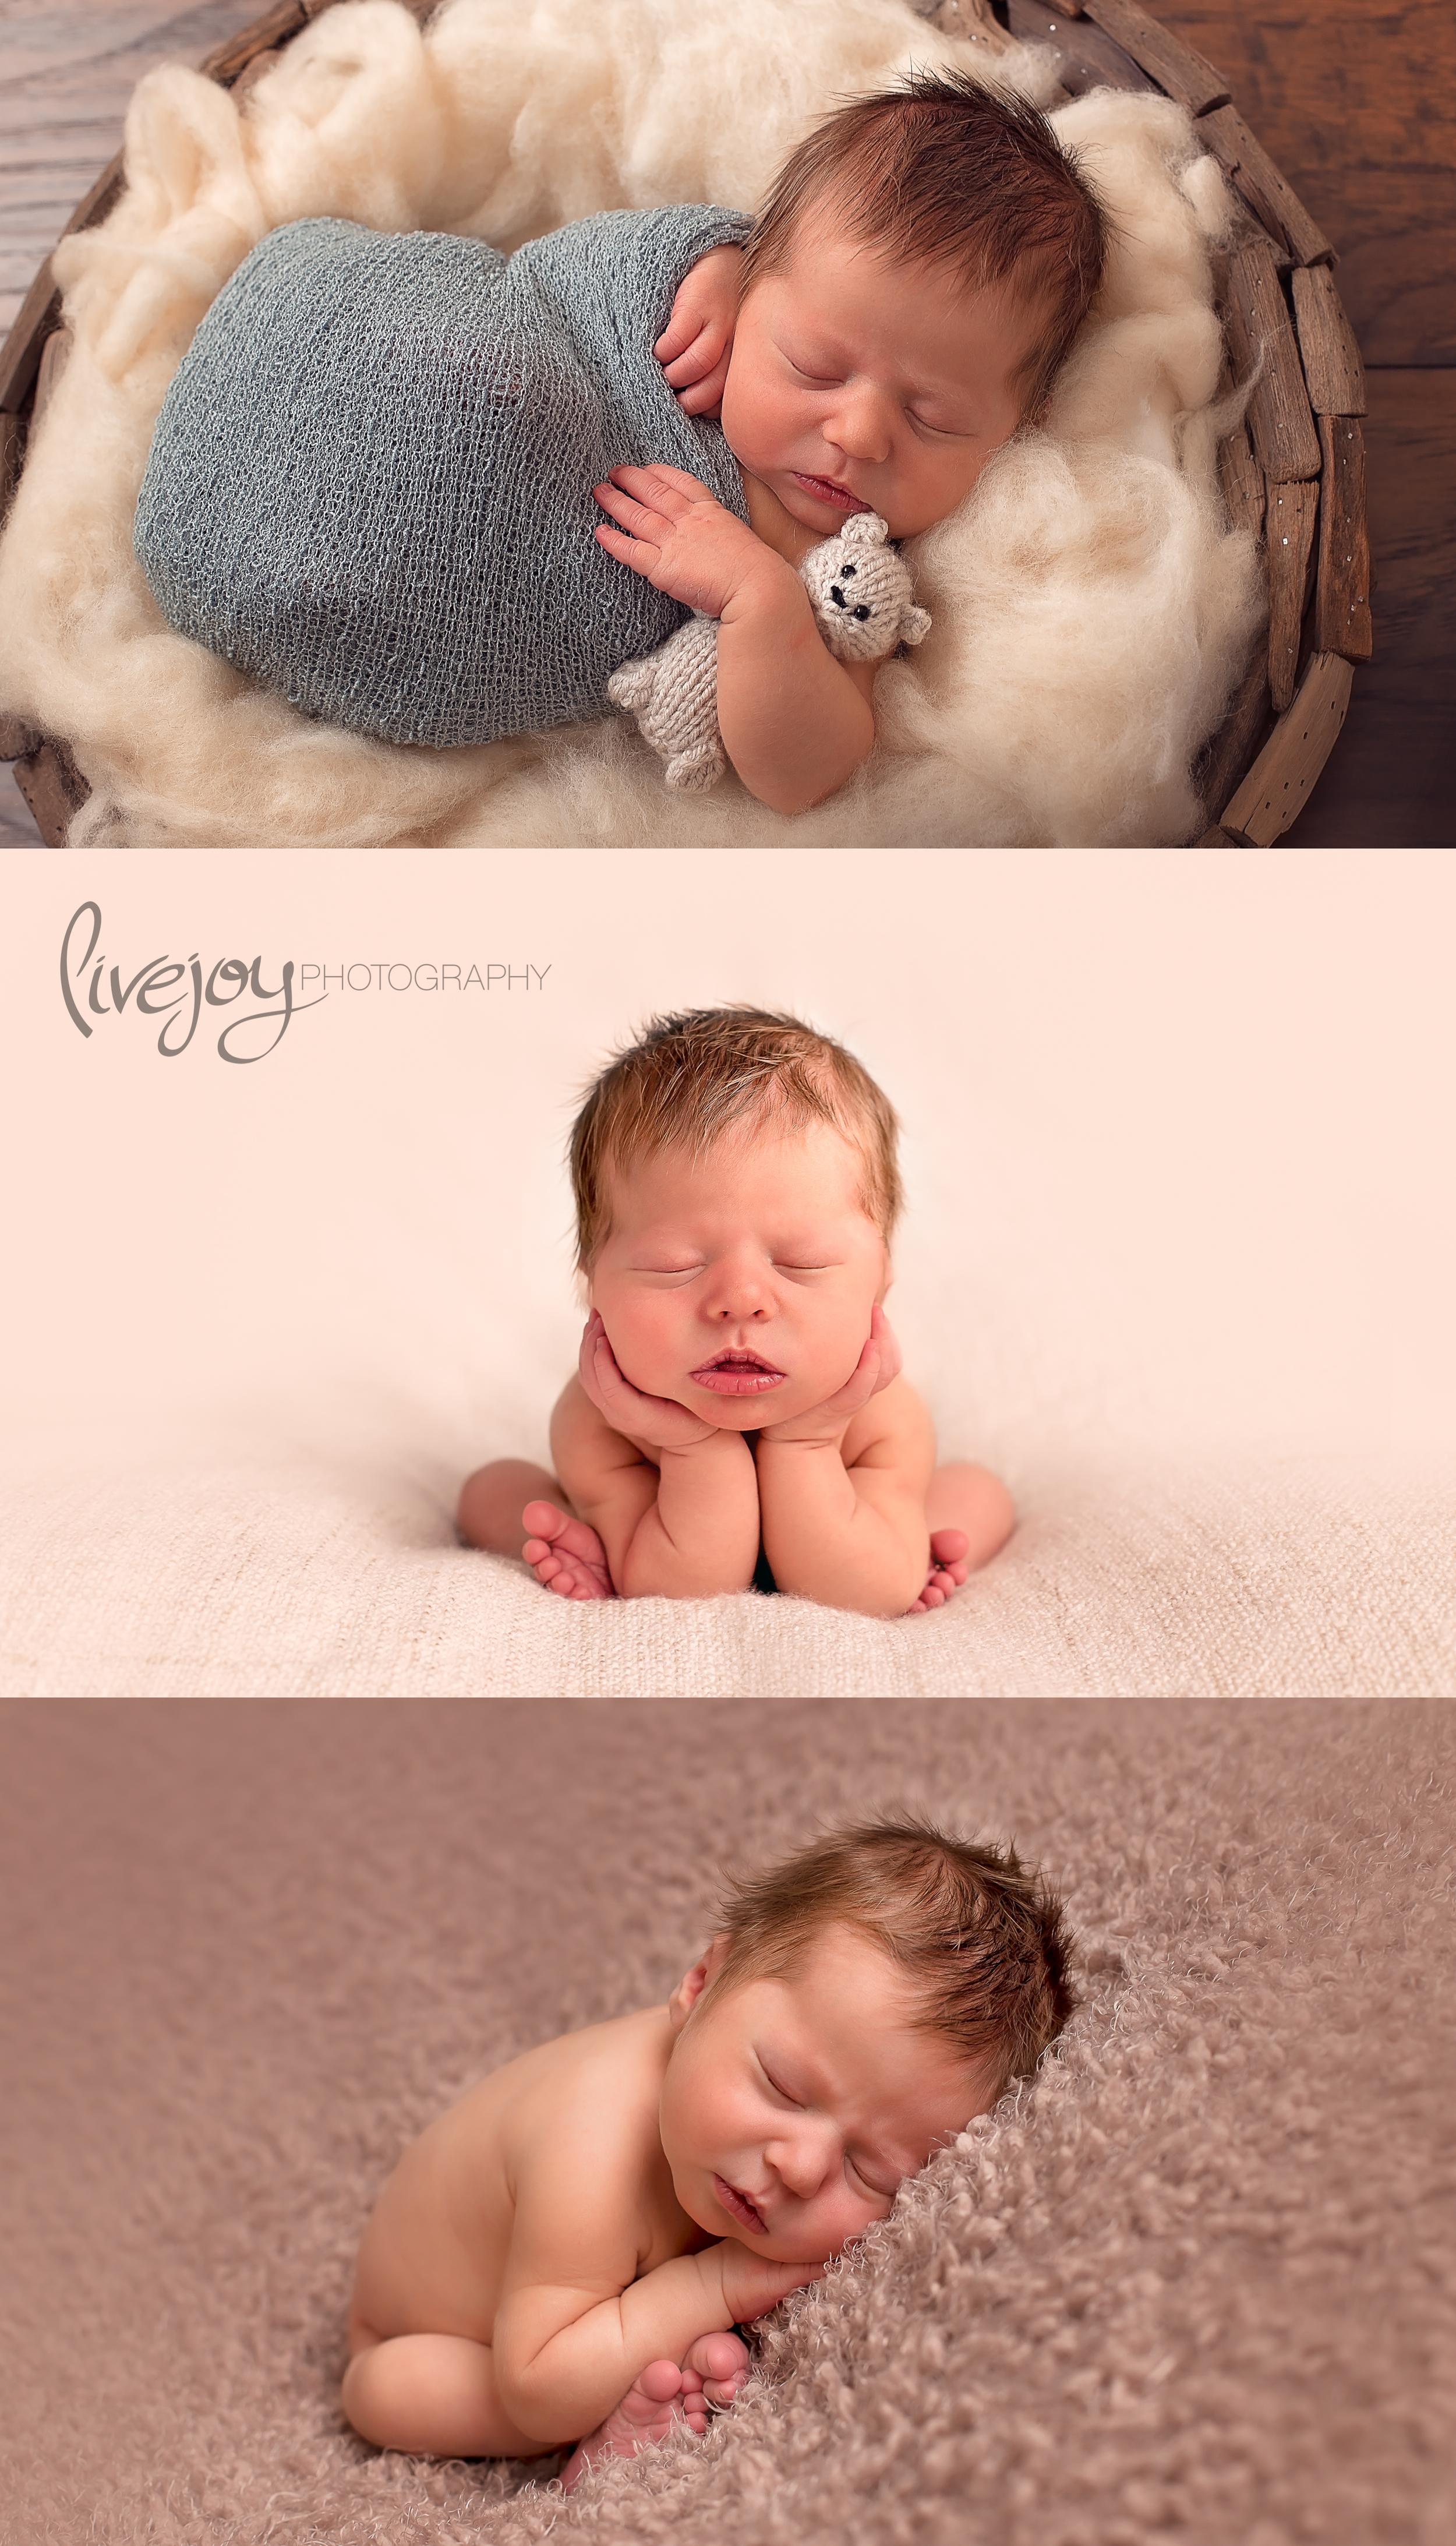 Newborn Photography | Oregon | LiveJoy Photgraphy